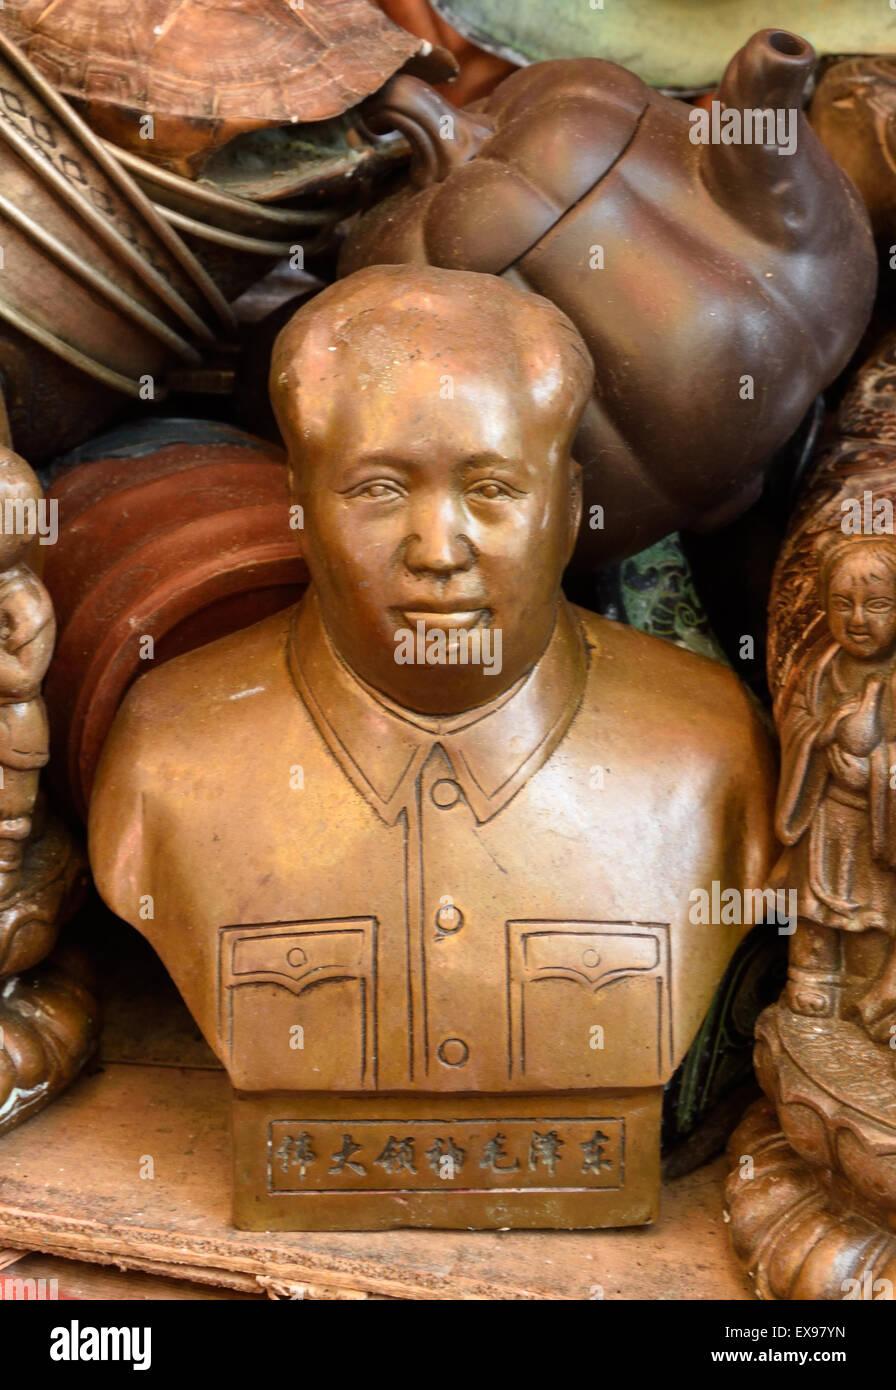 "Chinese First Chairman Mao Tse-tung Bronze Statue 13/""H"